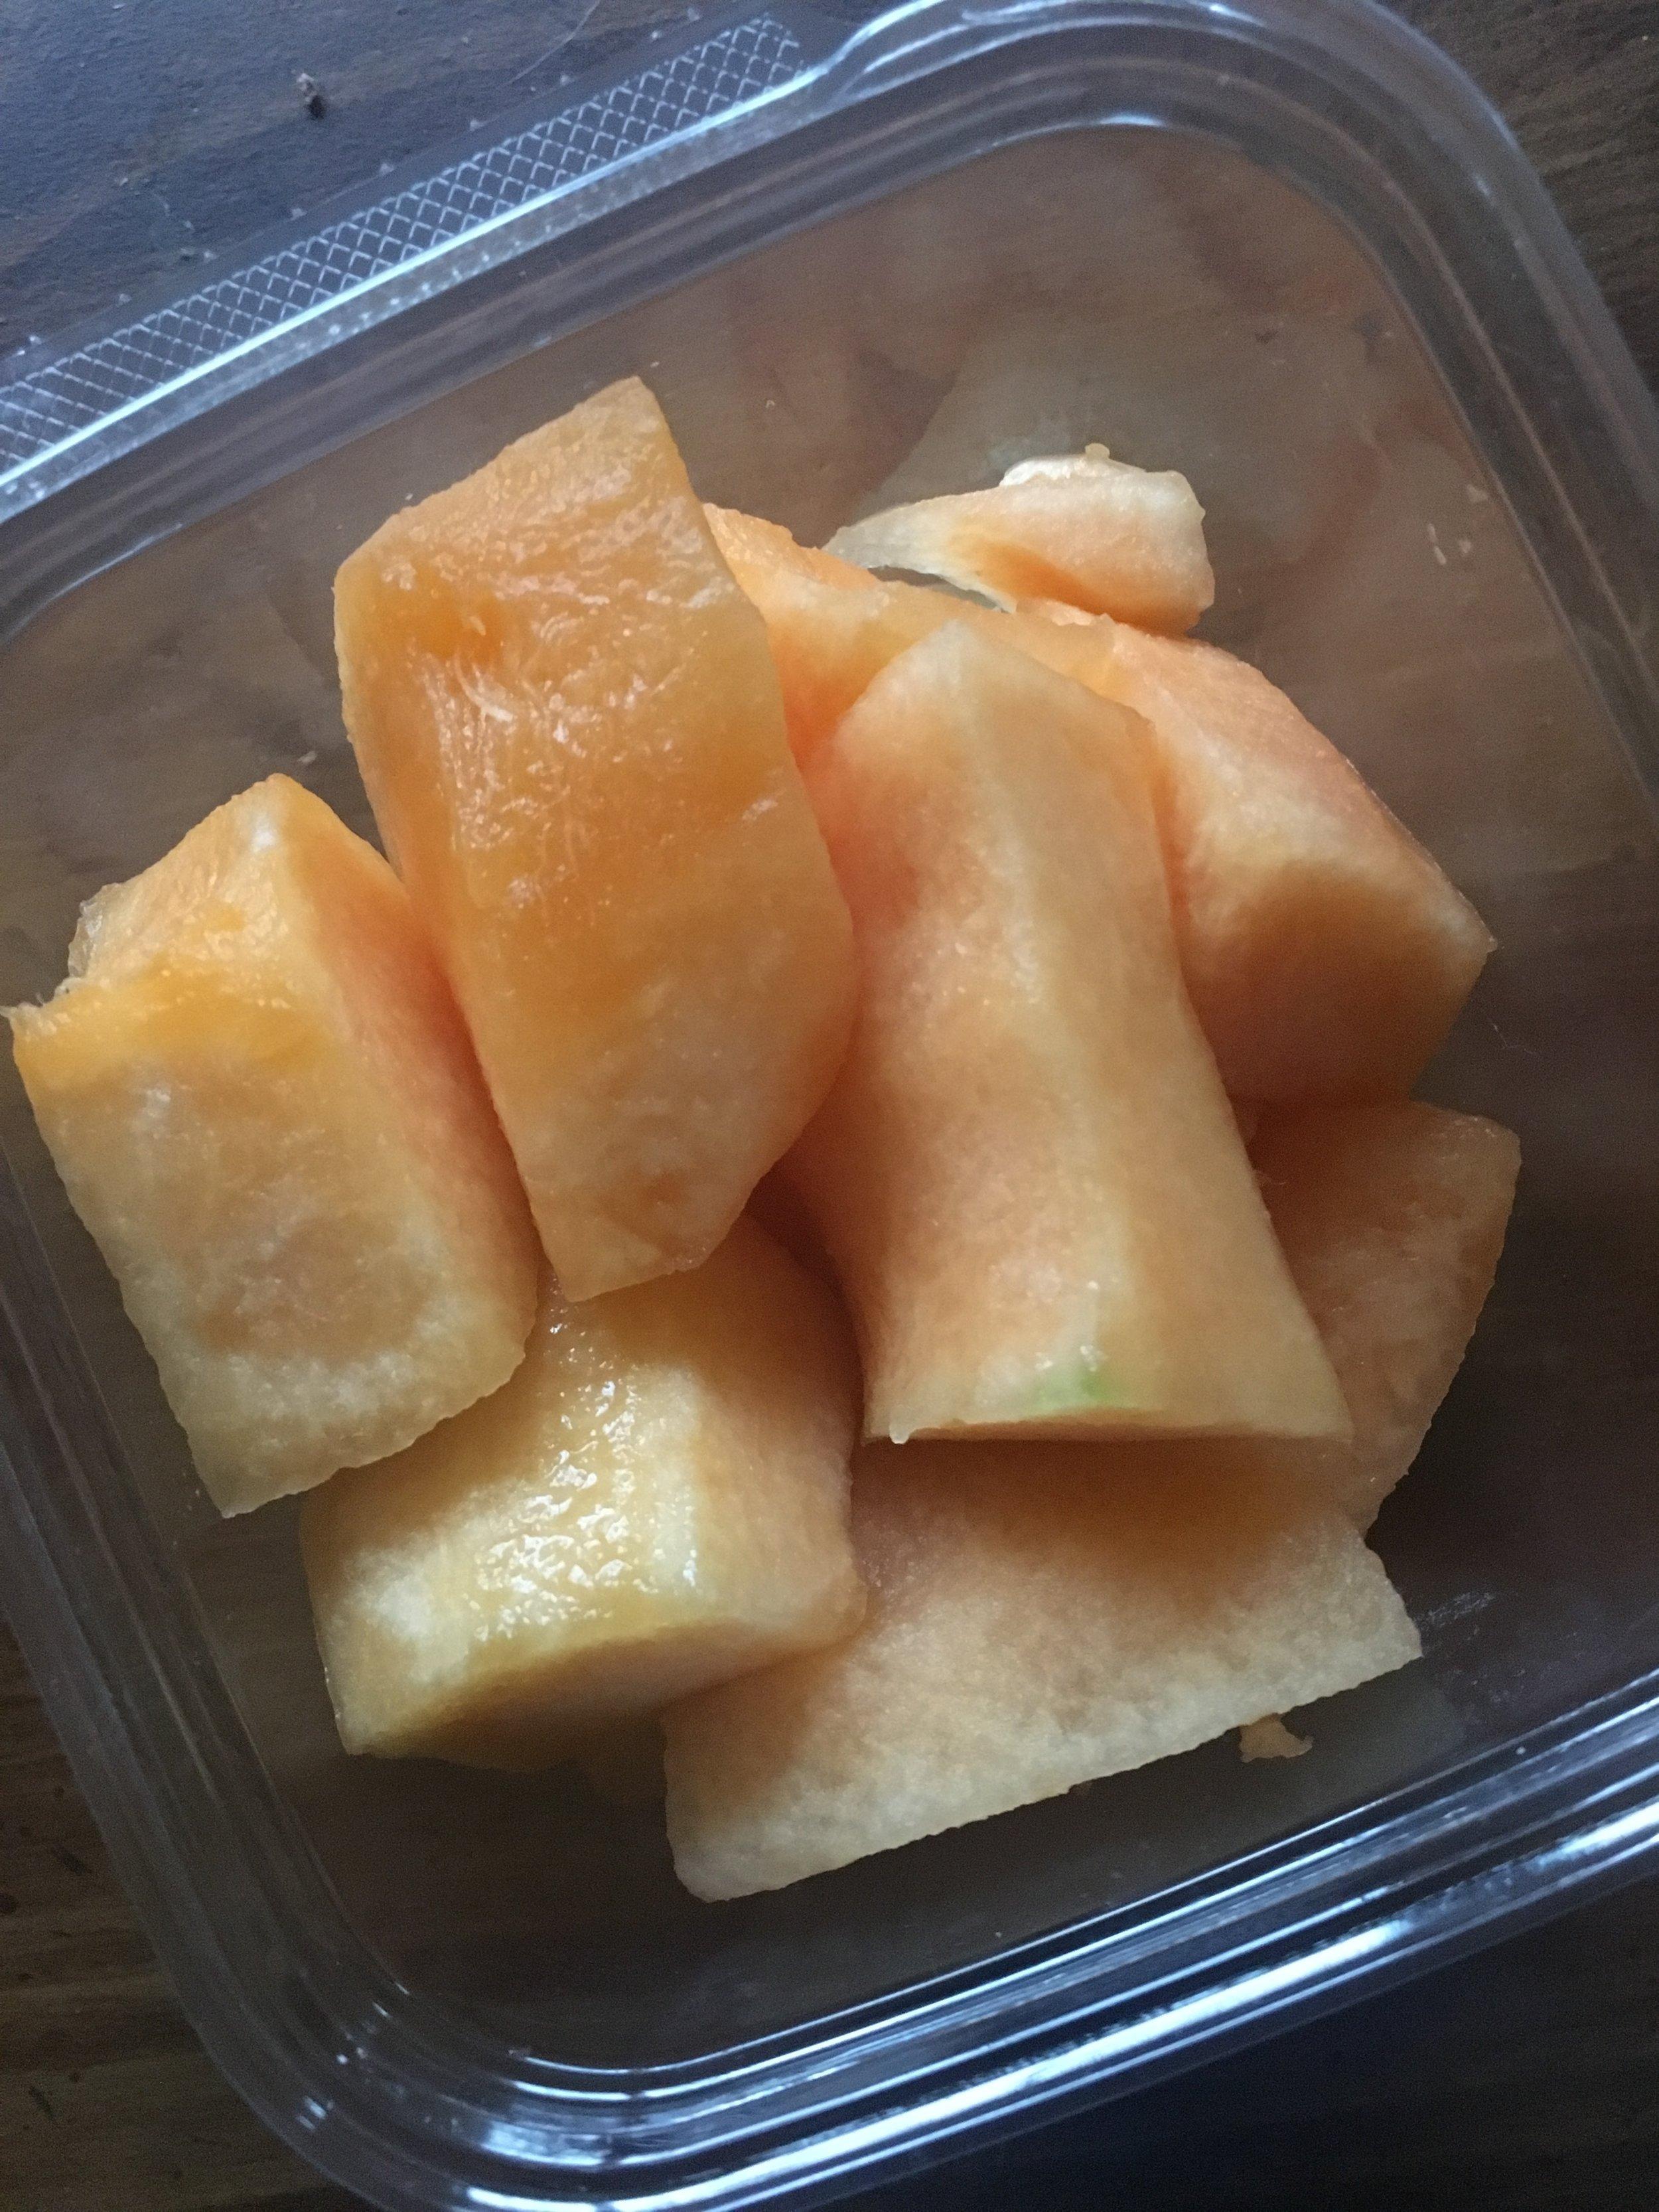 One of my favorite snacks!